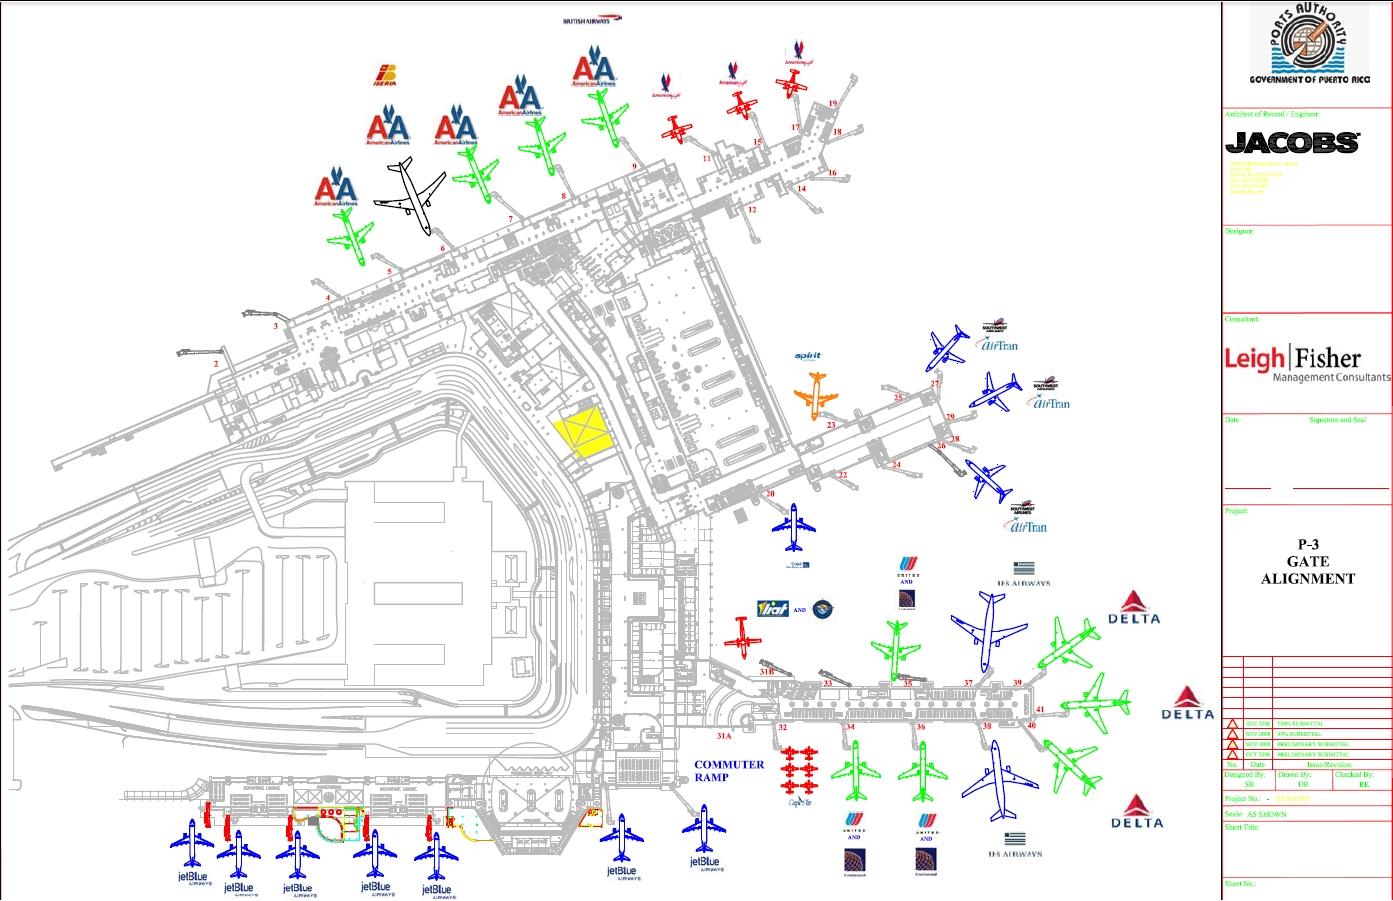 Carolina   Aeropuerto Internacional Luis Muñoz Marín   Sju in Mapa Aeropuerto Miami Florida